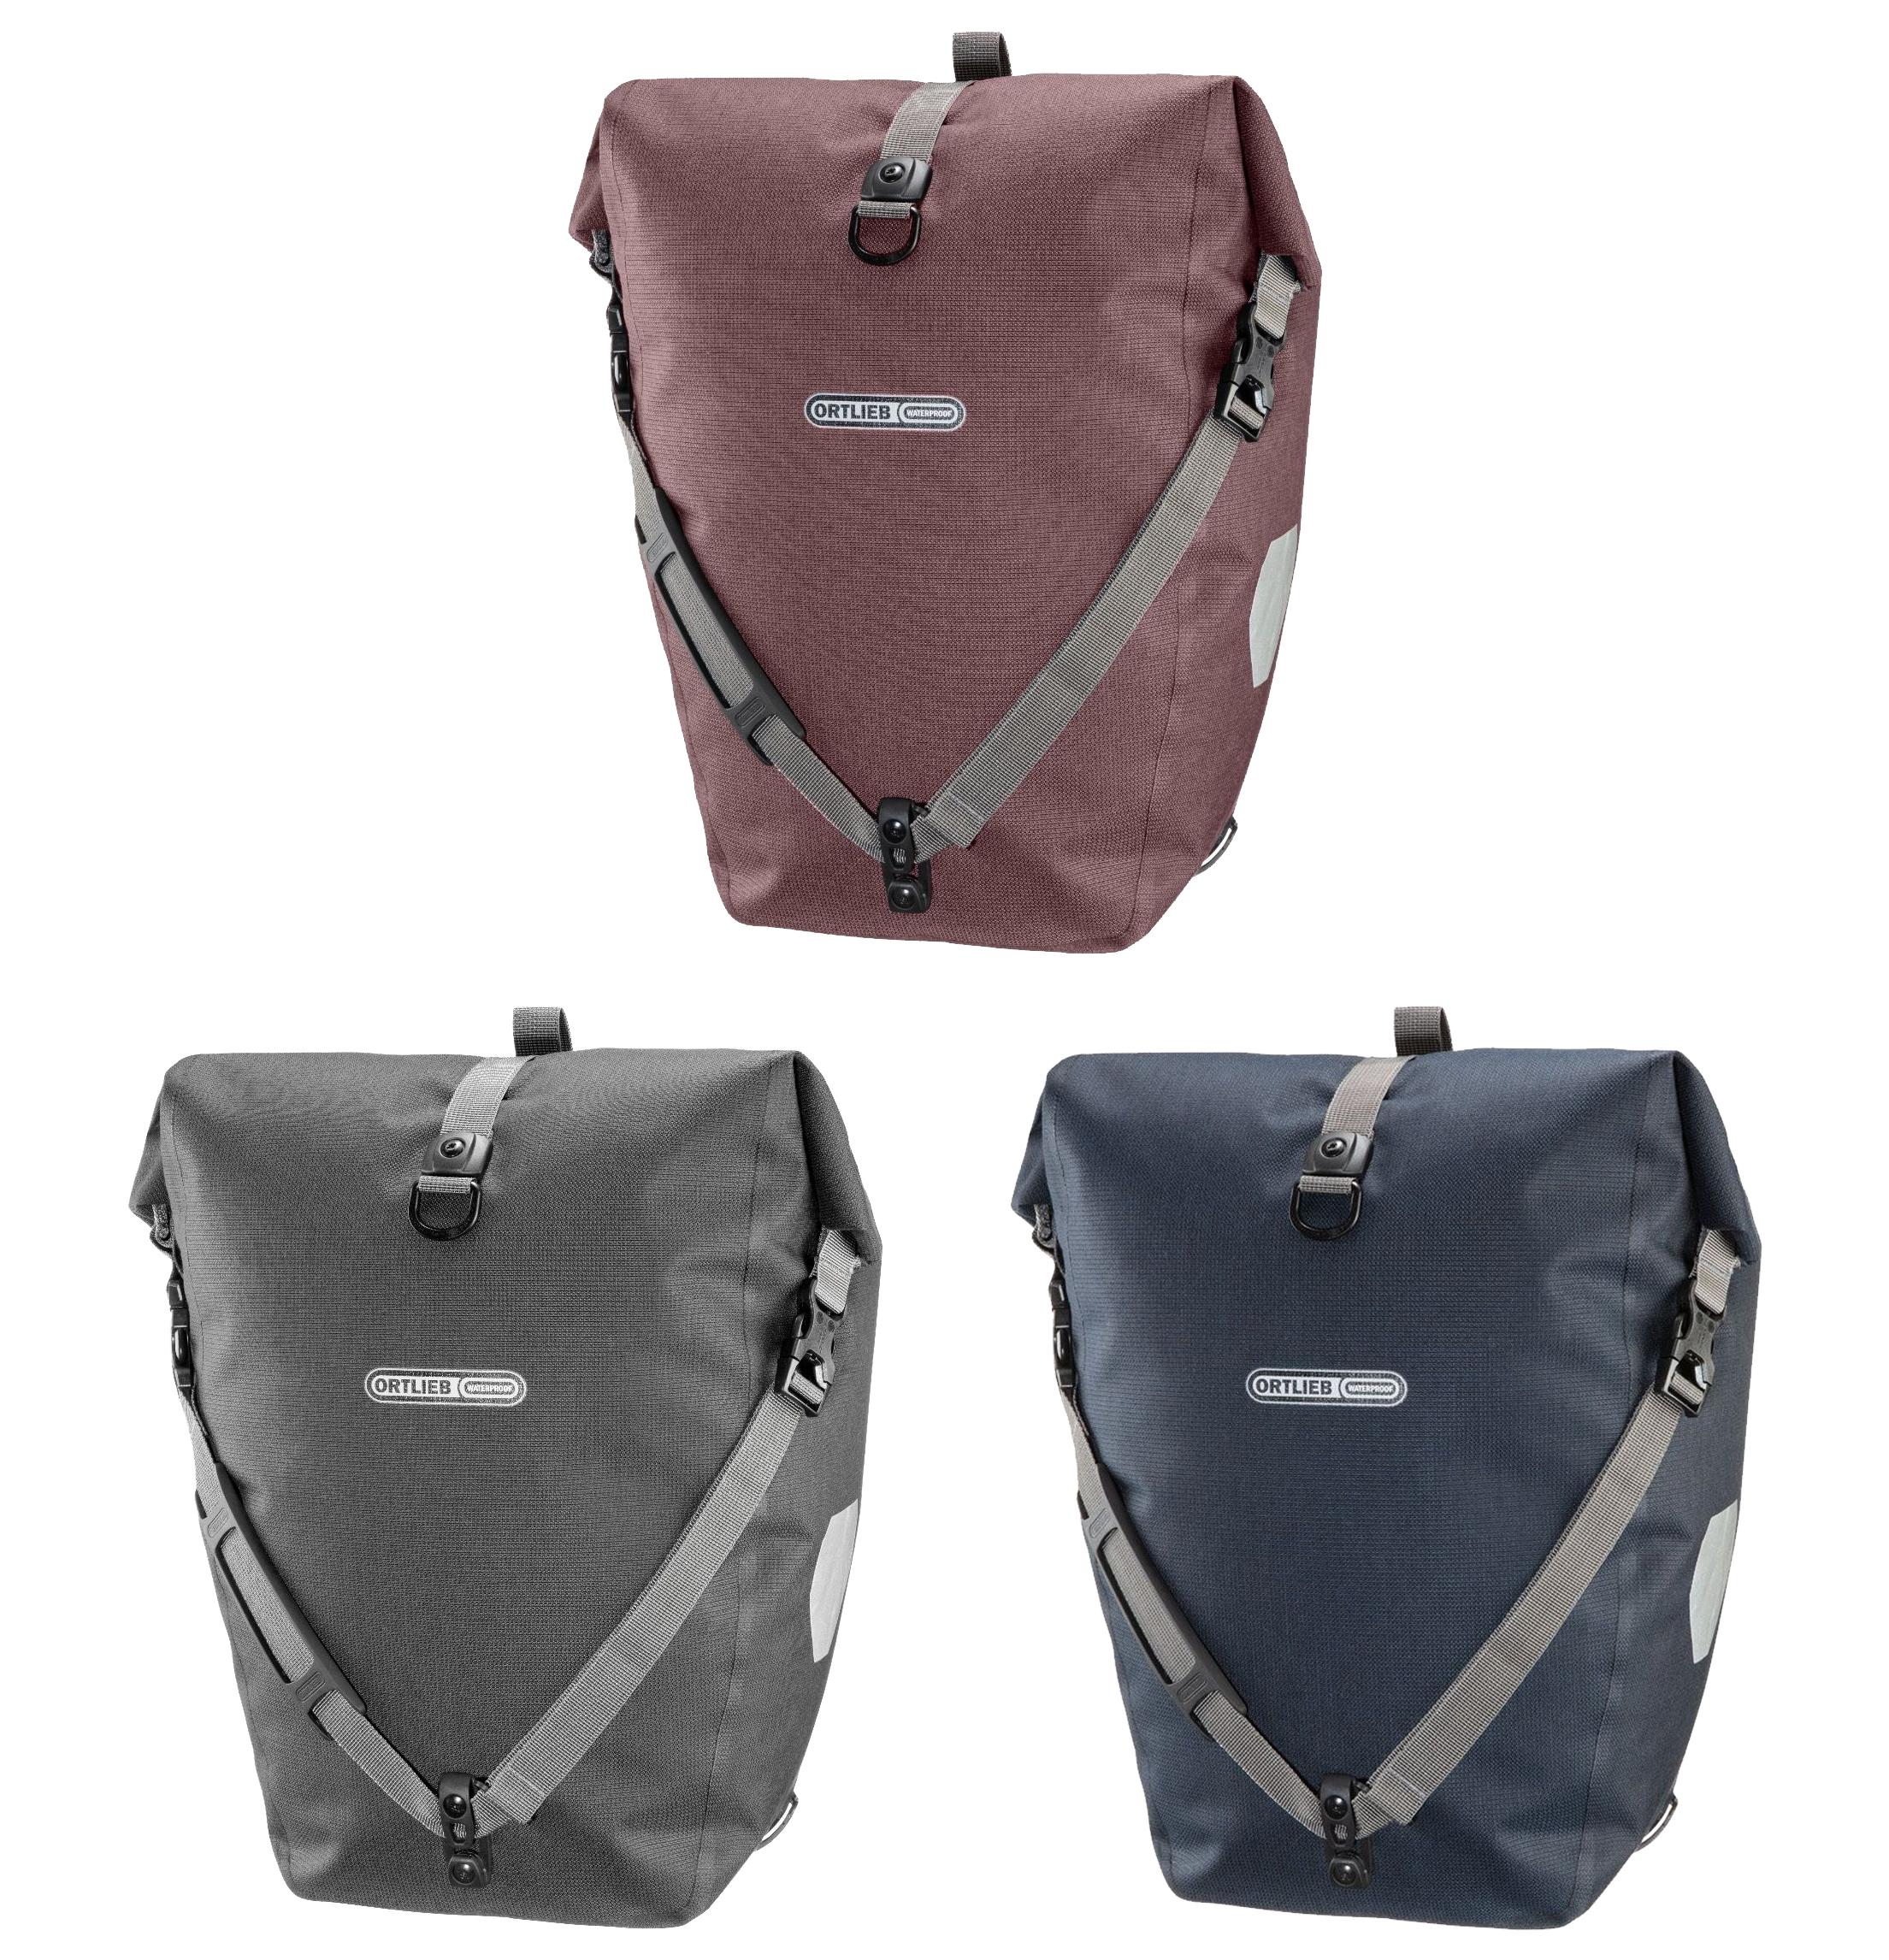 Ortlieb Back Roller Urban Single Ql2.1 Pannier 20 Litre | Rack bags